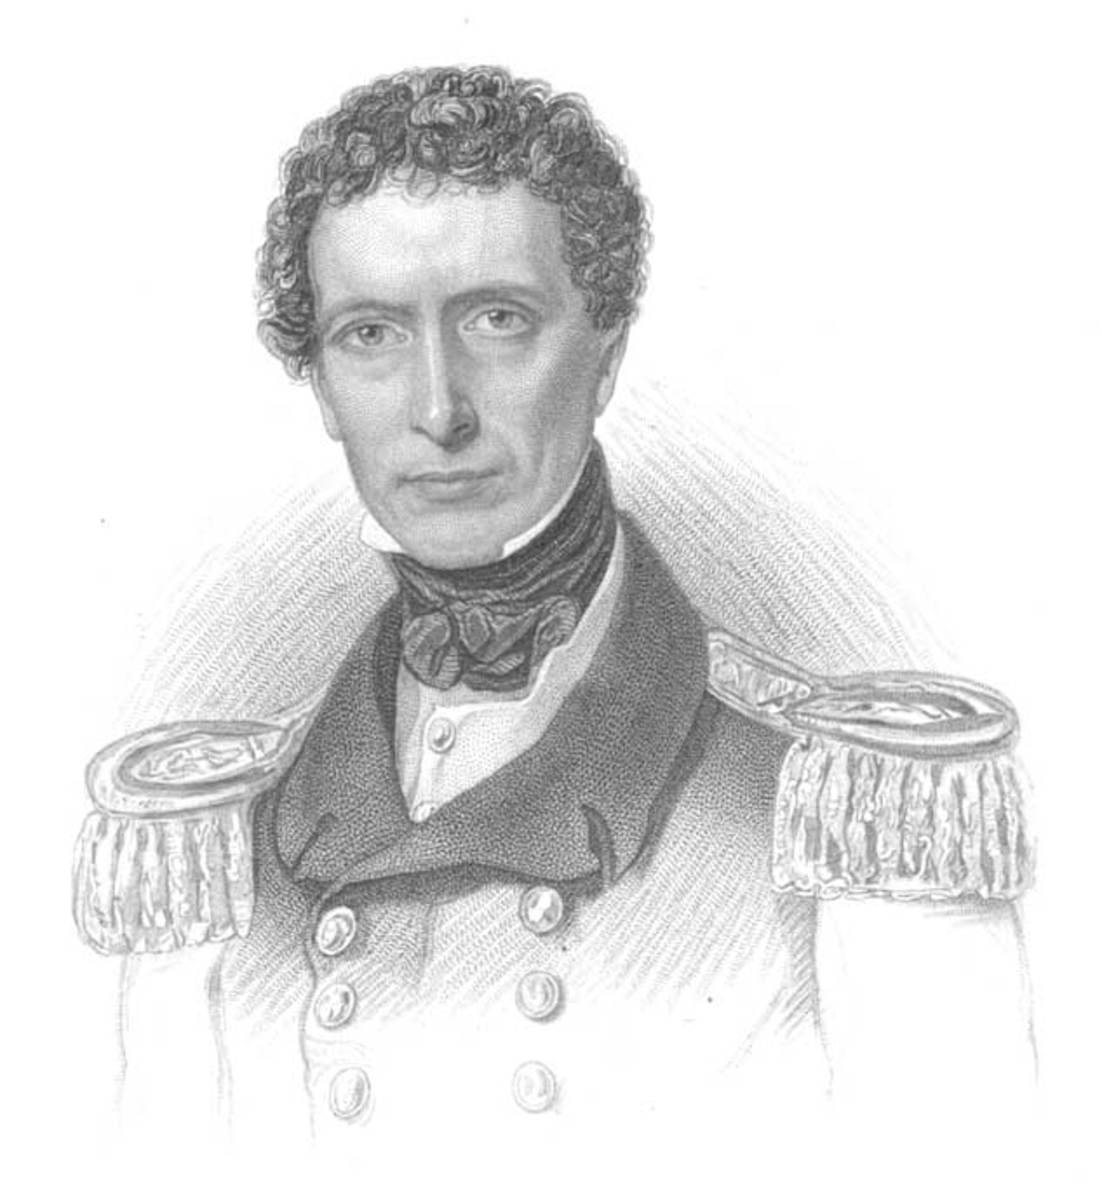 ALLEN GARDINER, COMMANDER, BRITISH ROYAL NAVY